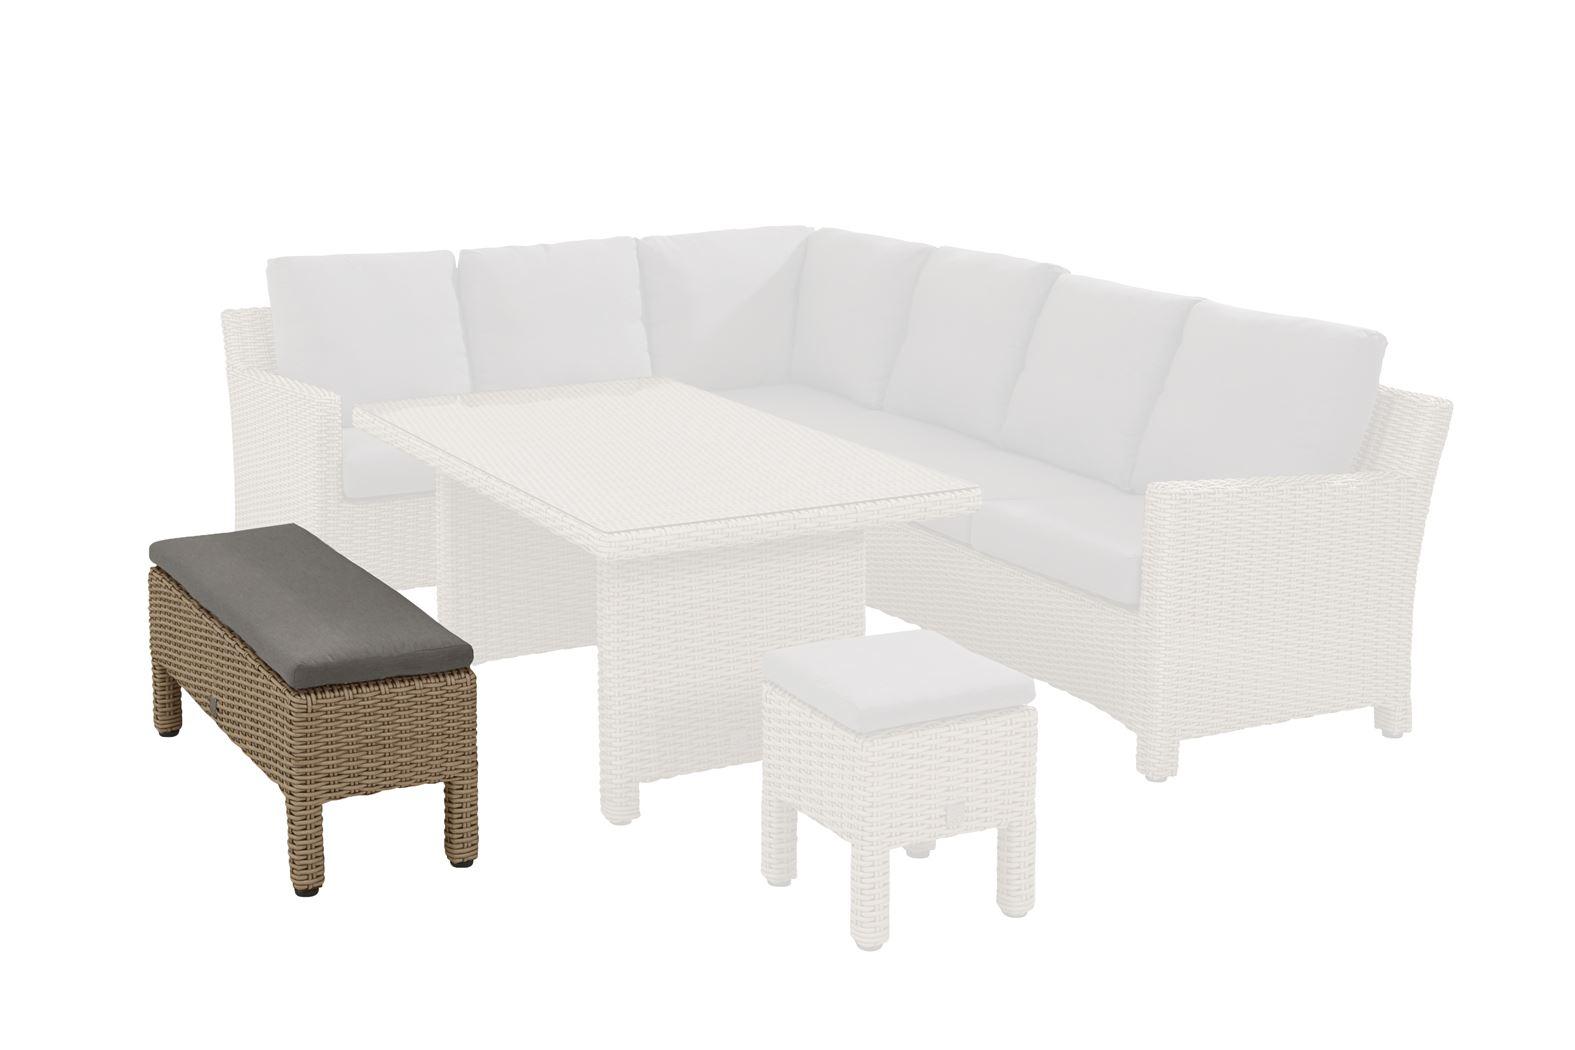 4so adora cosy dining bench (big stool) with cushion caramel